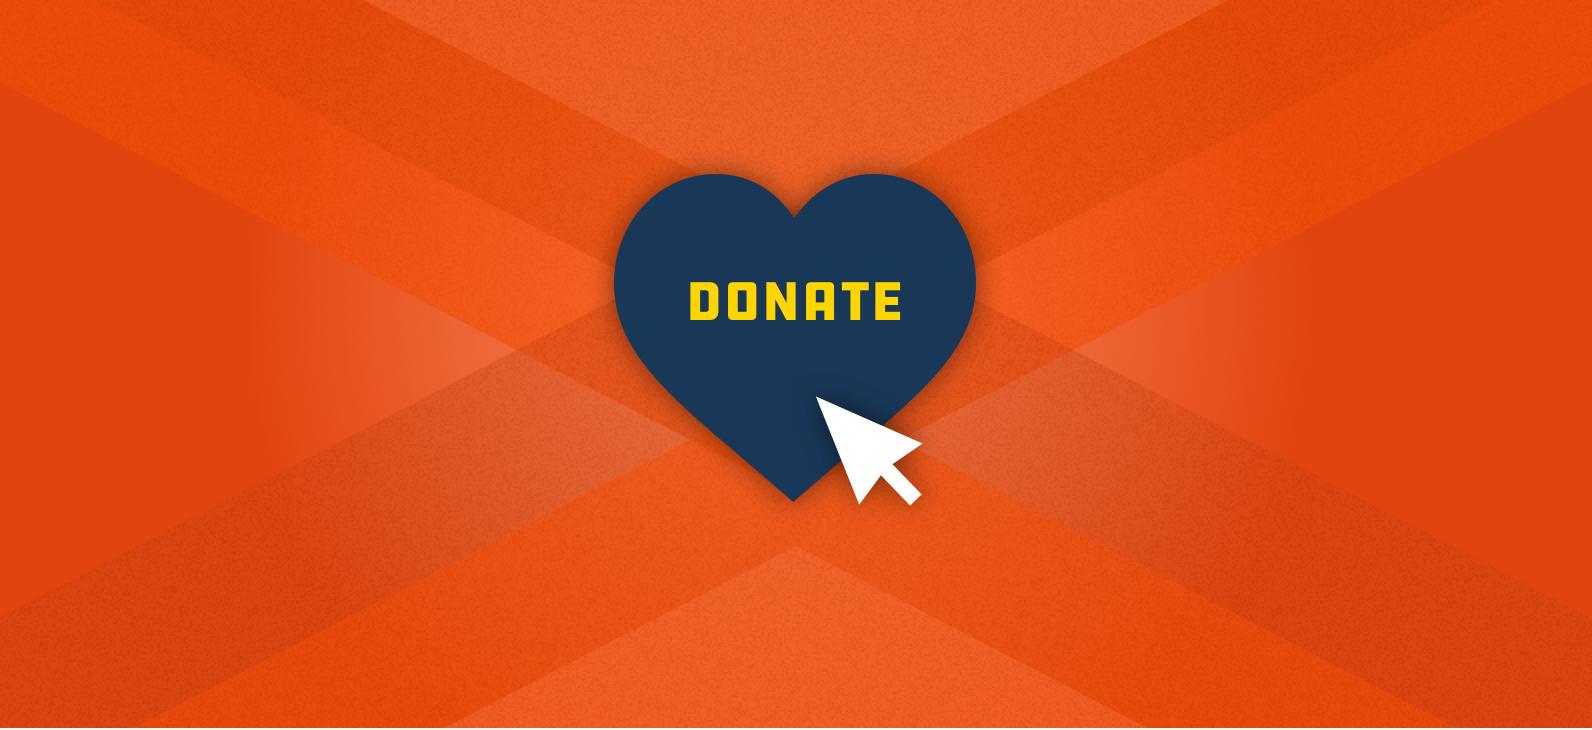 web donations best practices